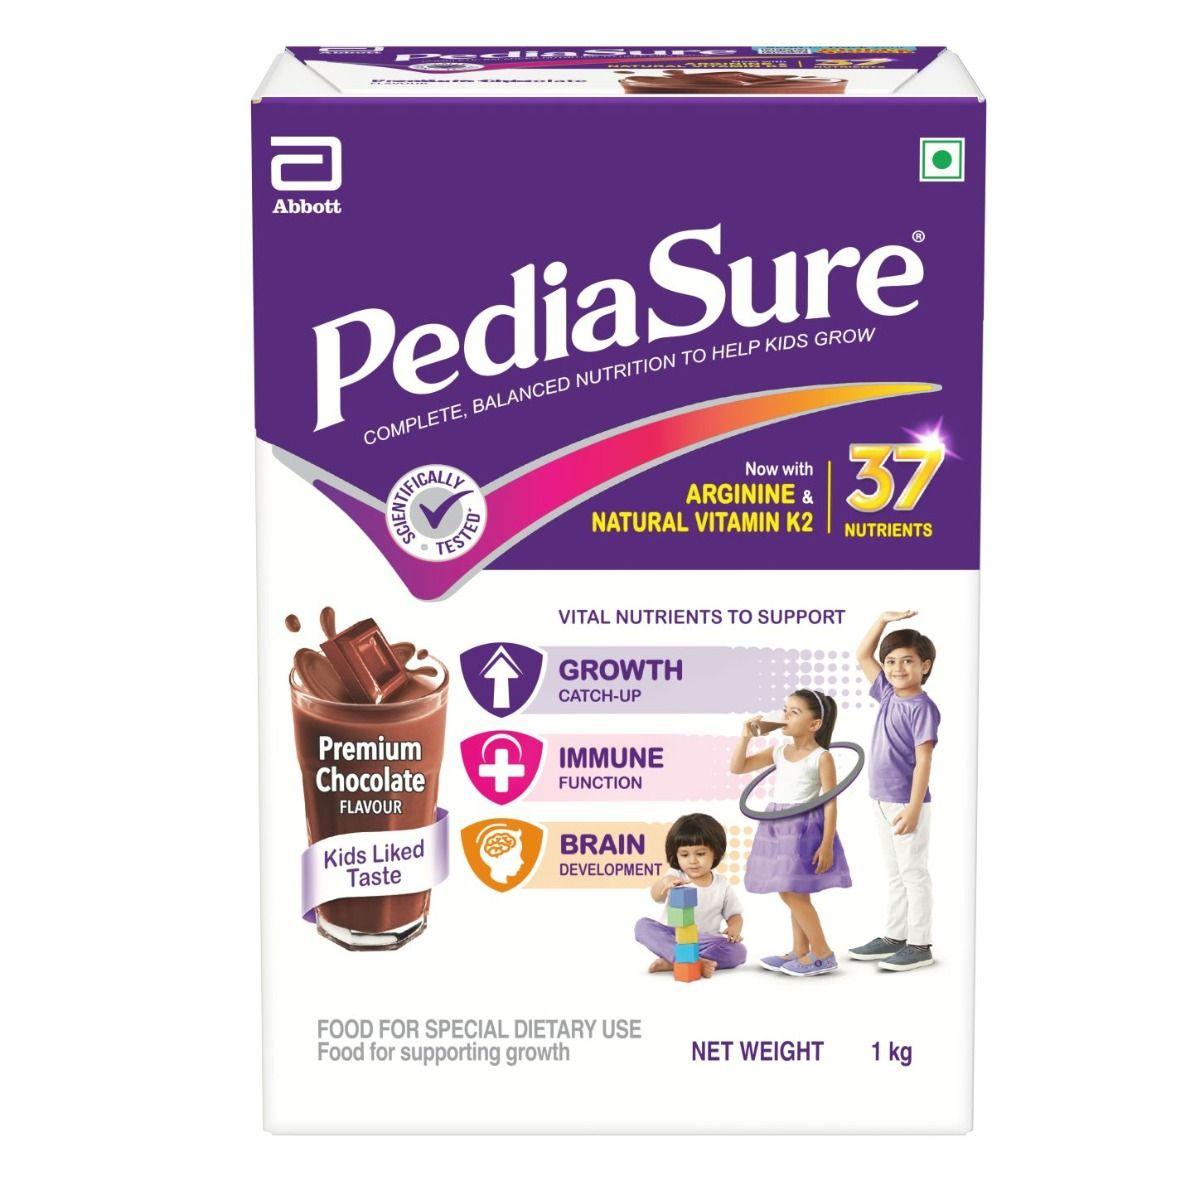 Pediasure Premium Chocolate Flavoured Kids Nutrition Drink,  1 Kg Refill Pack